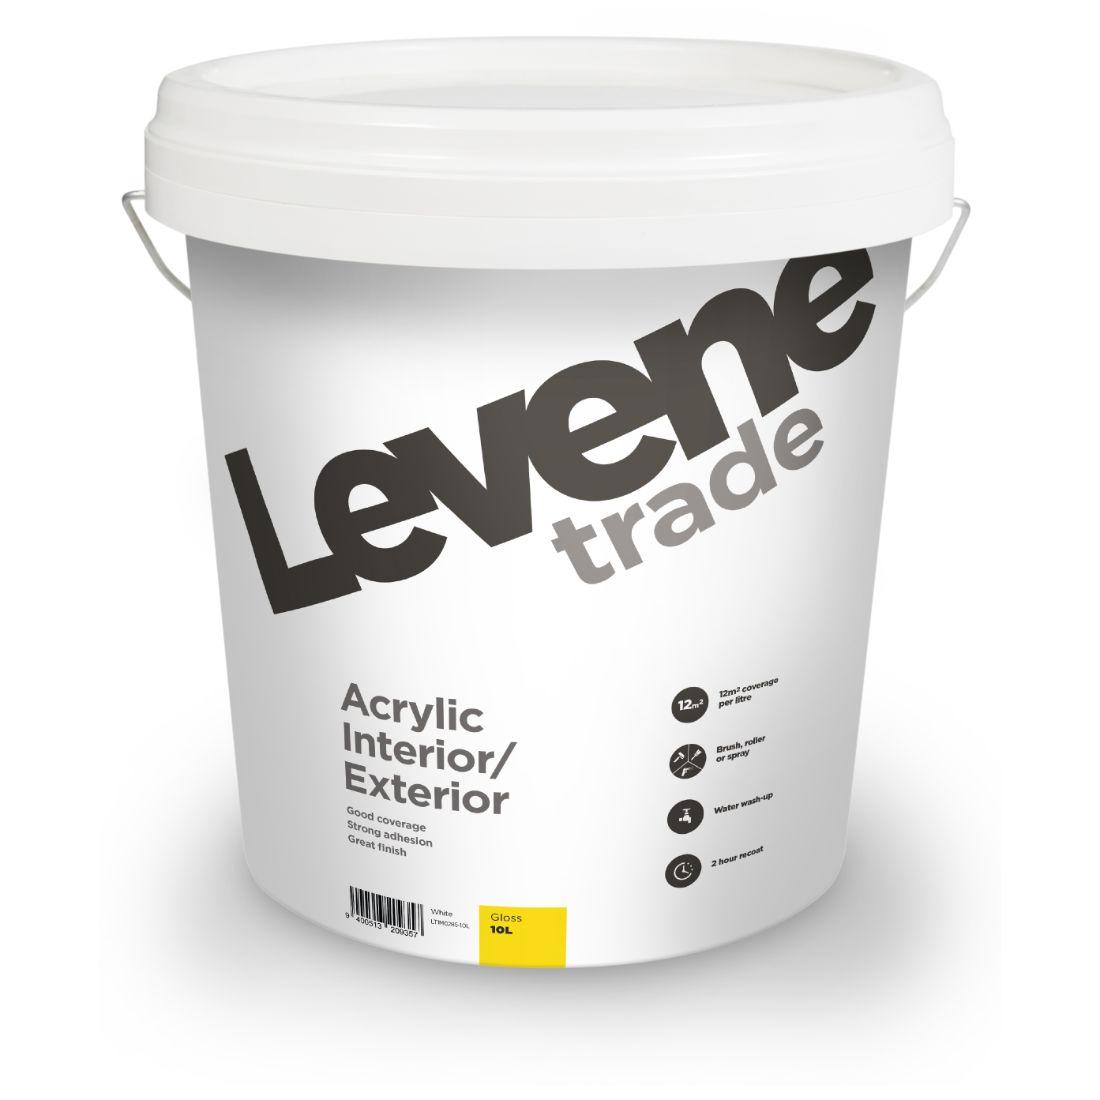 Trade Acrylic Interior Exterior Gloss White 10L